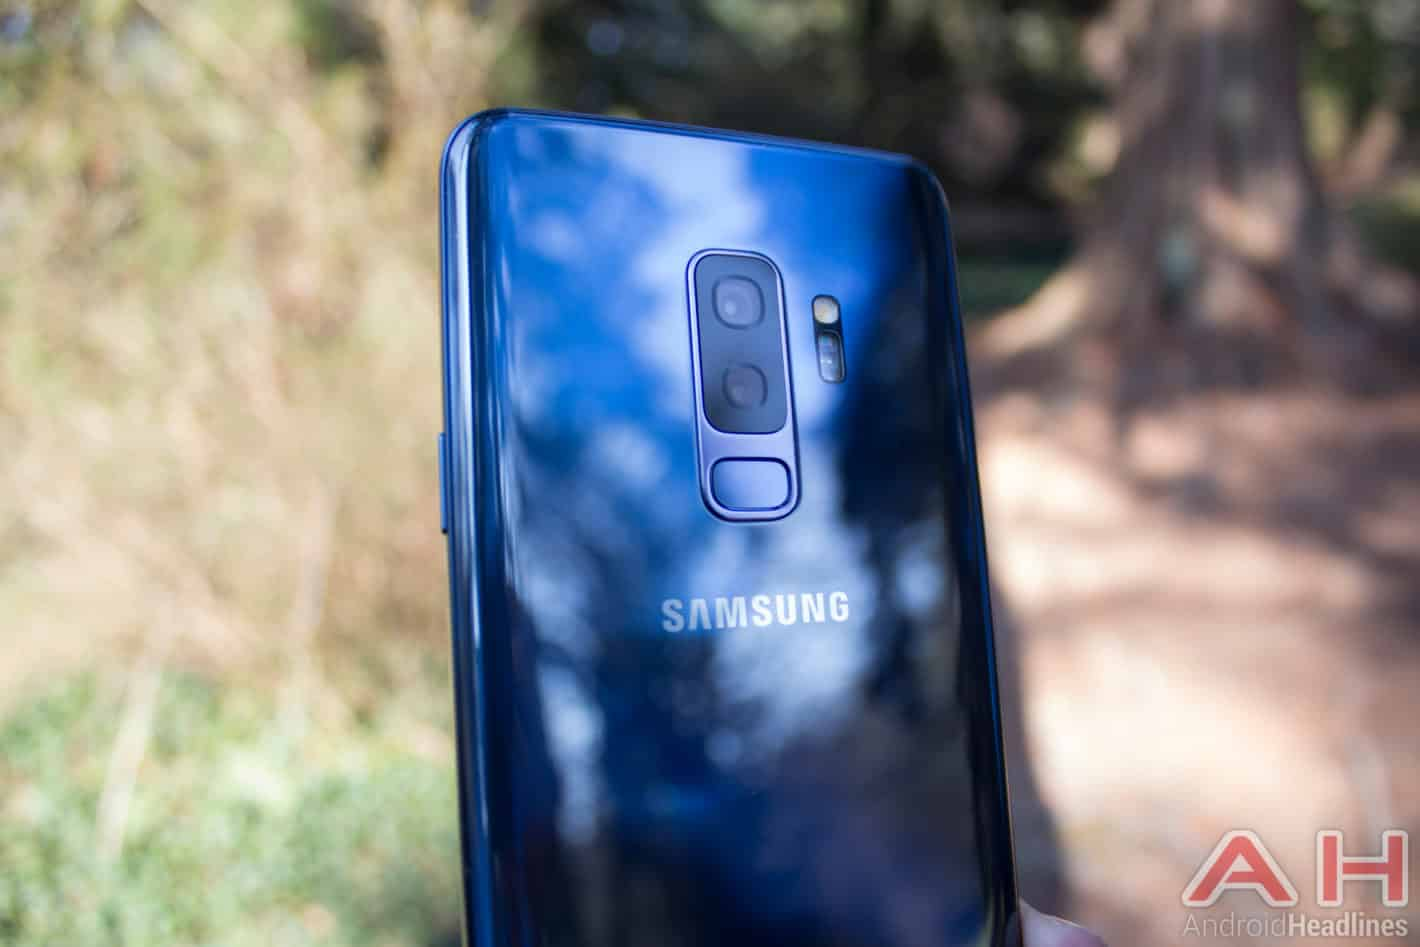 Samsung Galaxy S9 Plus AH NS 36 logo